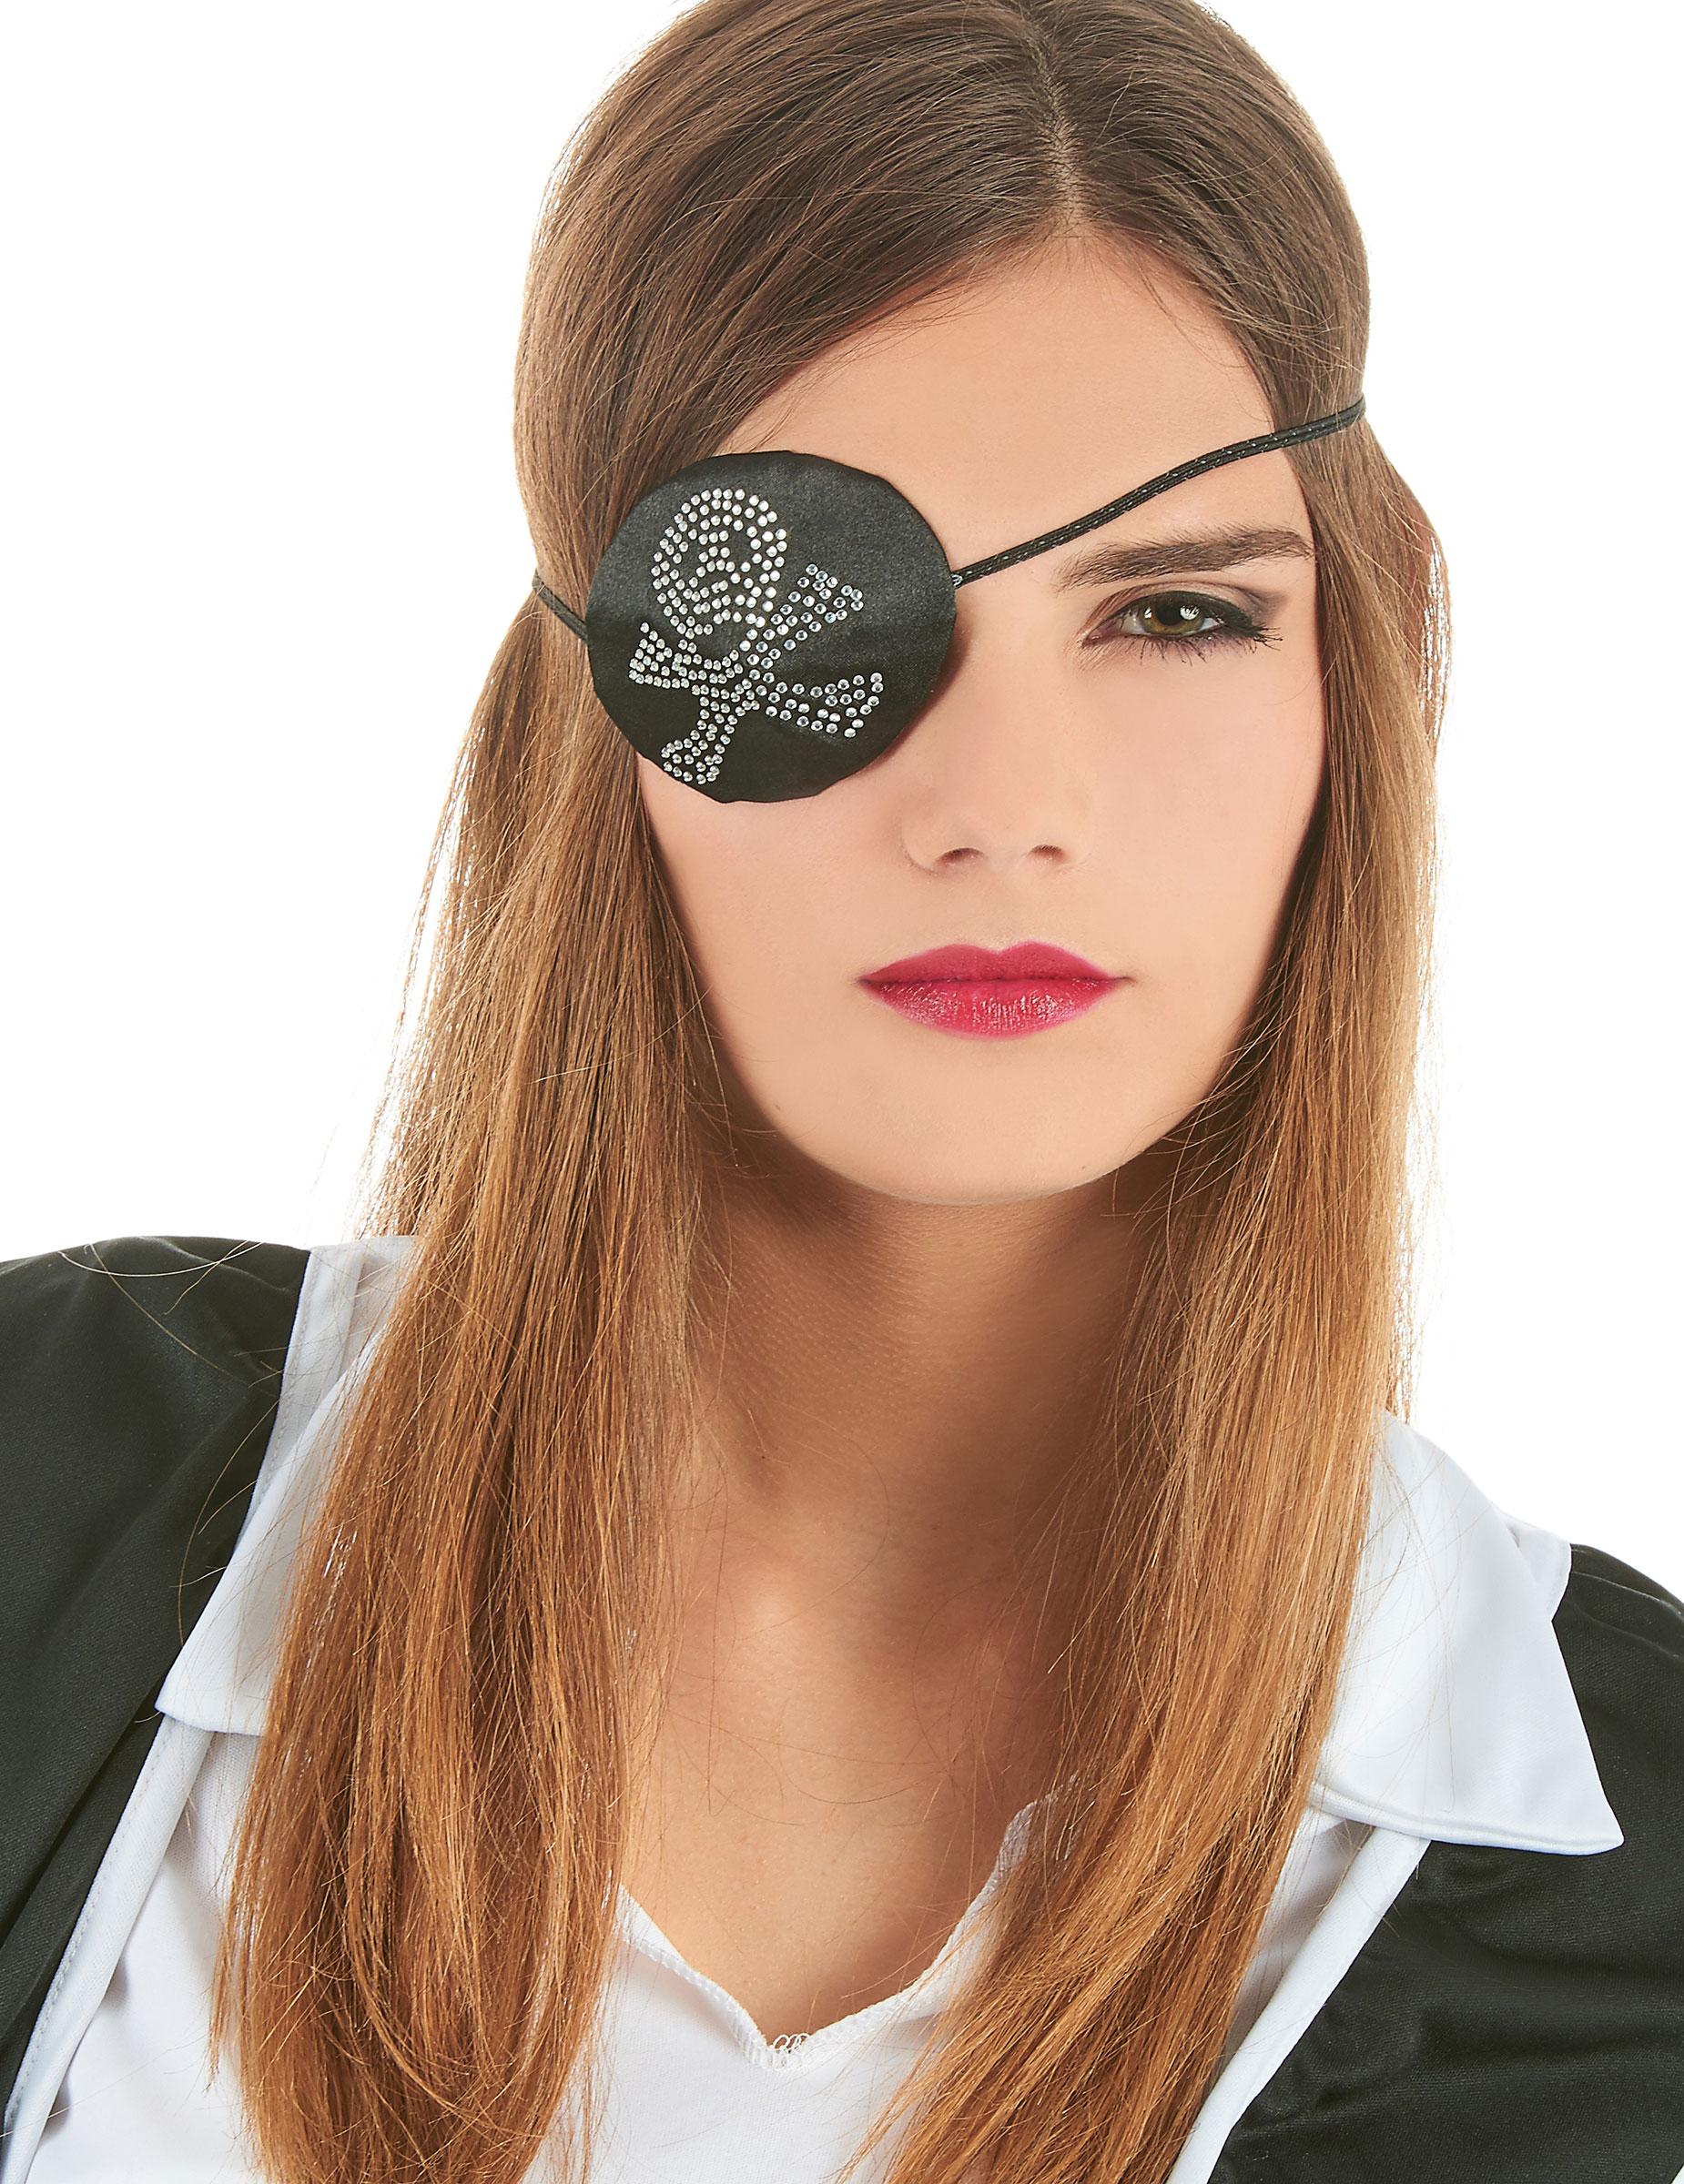 Parche De Pirata Para Mujer Accesoriosy Disfraces Originales - Maquillaje-de-pirata-para-mujer